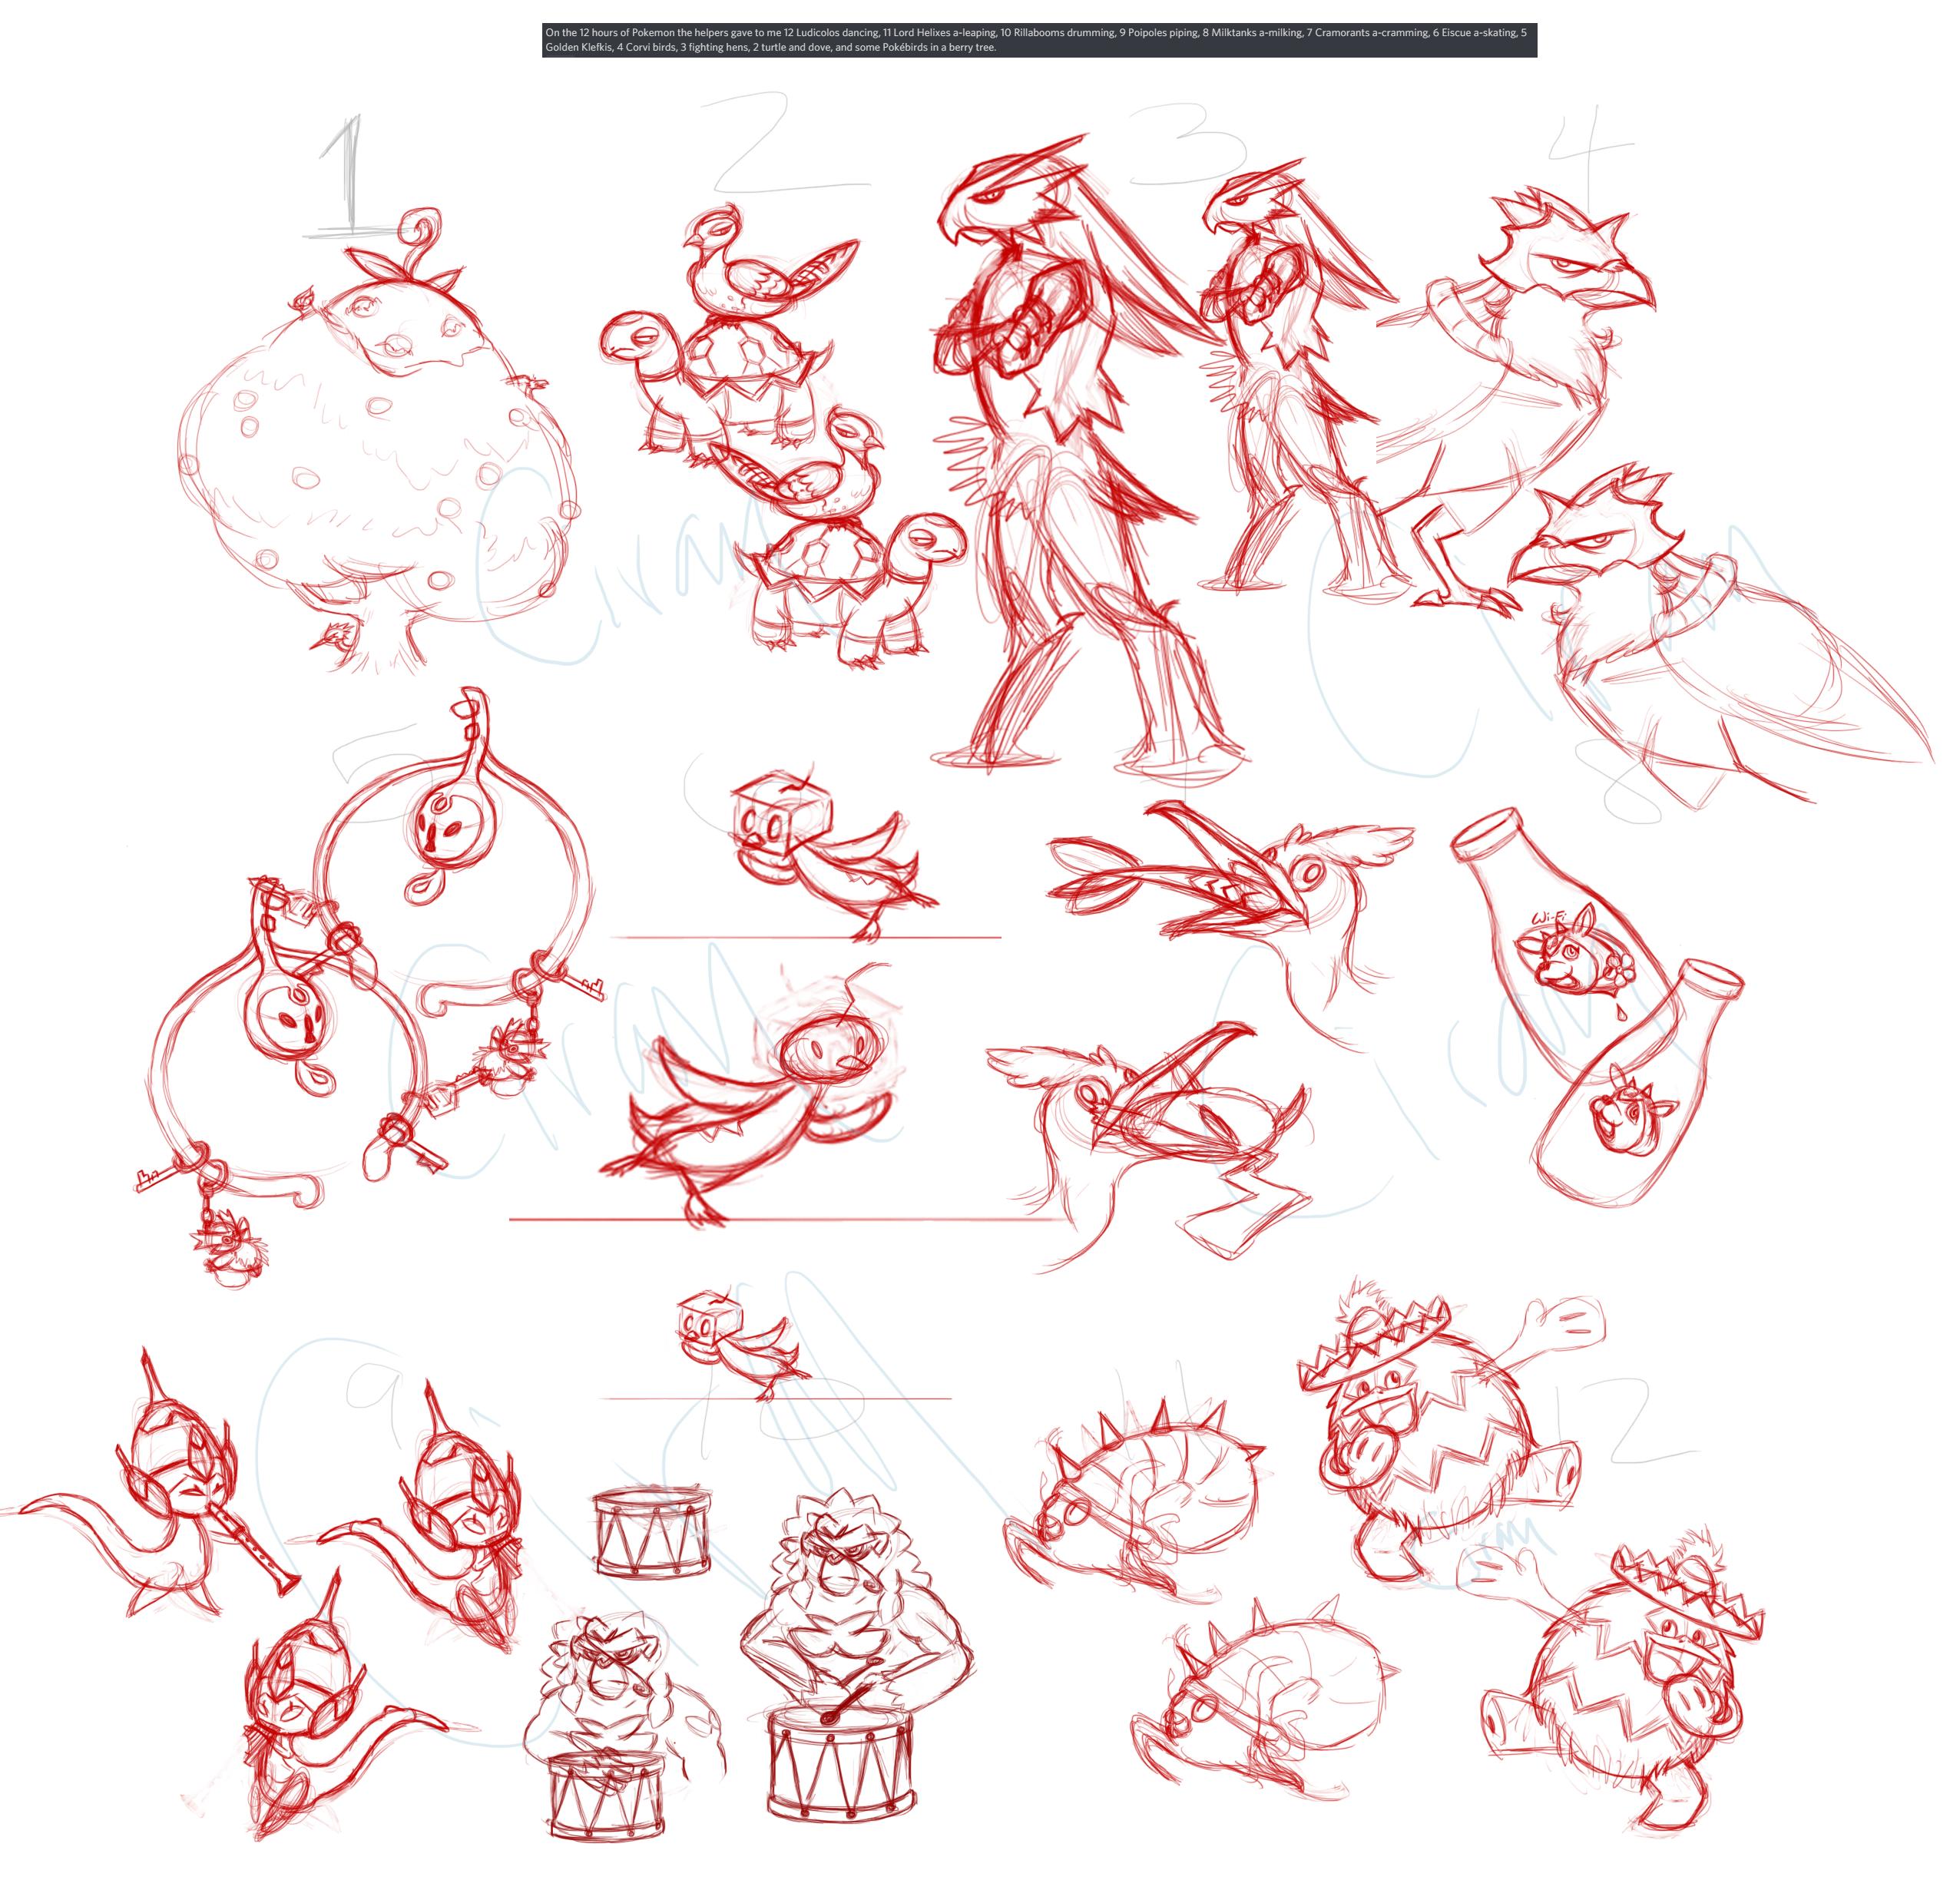 12DaysofPokemon_Dec2020-sketches.png